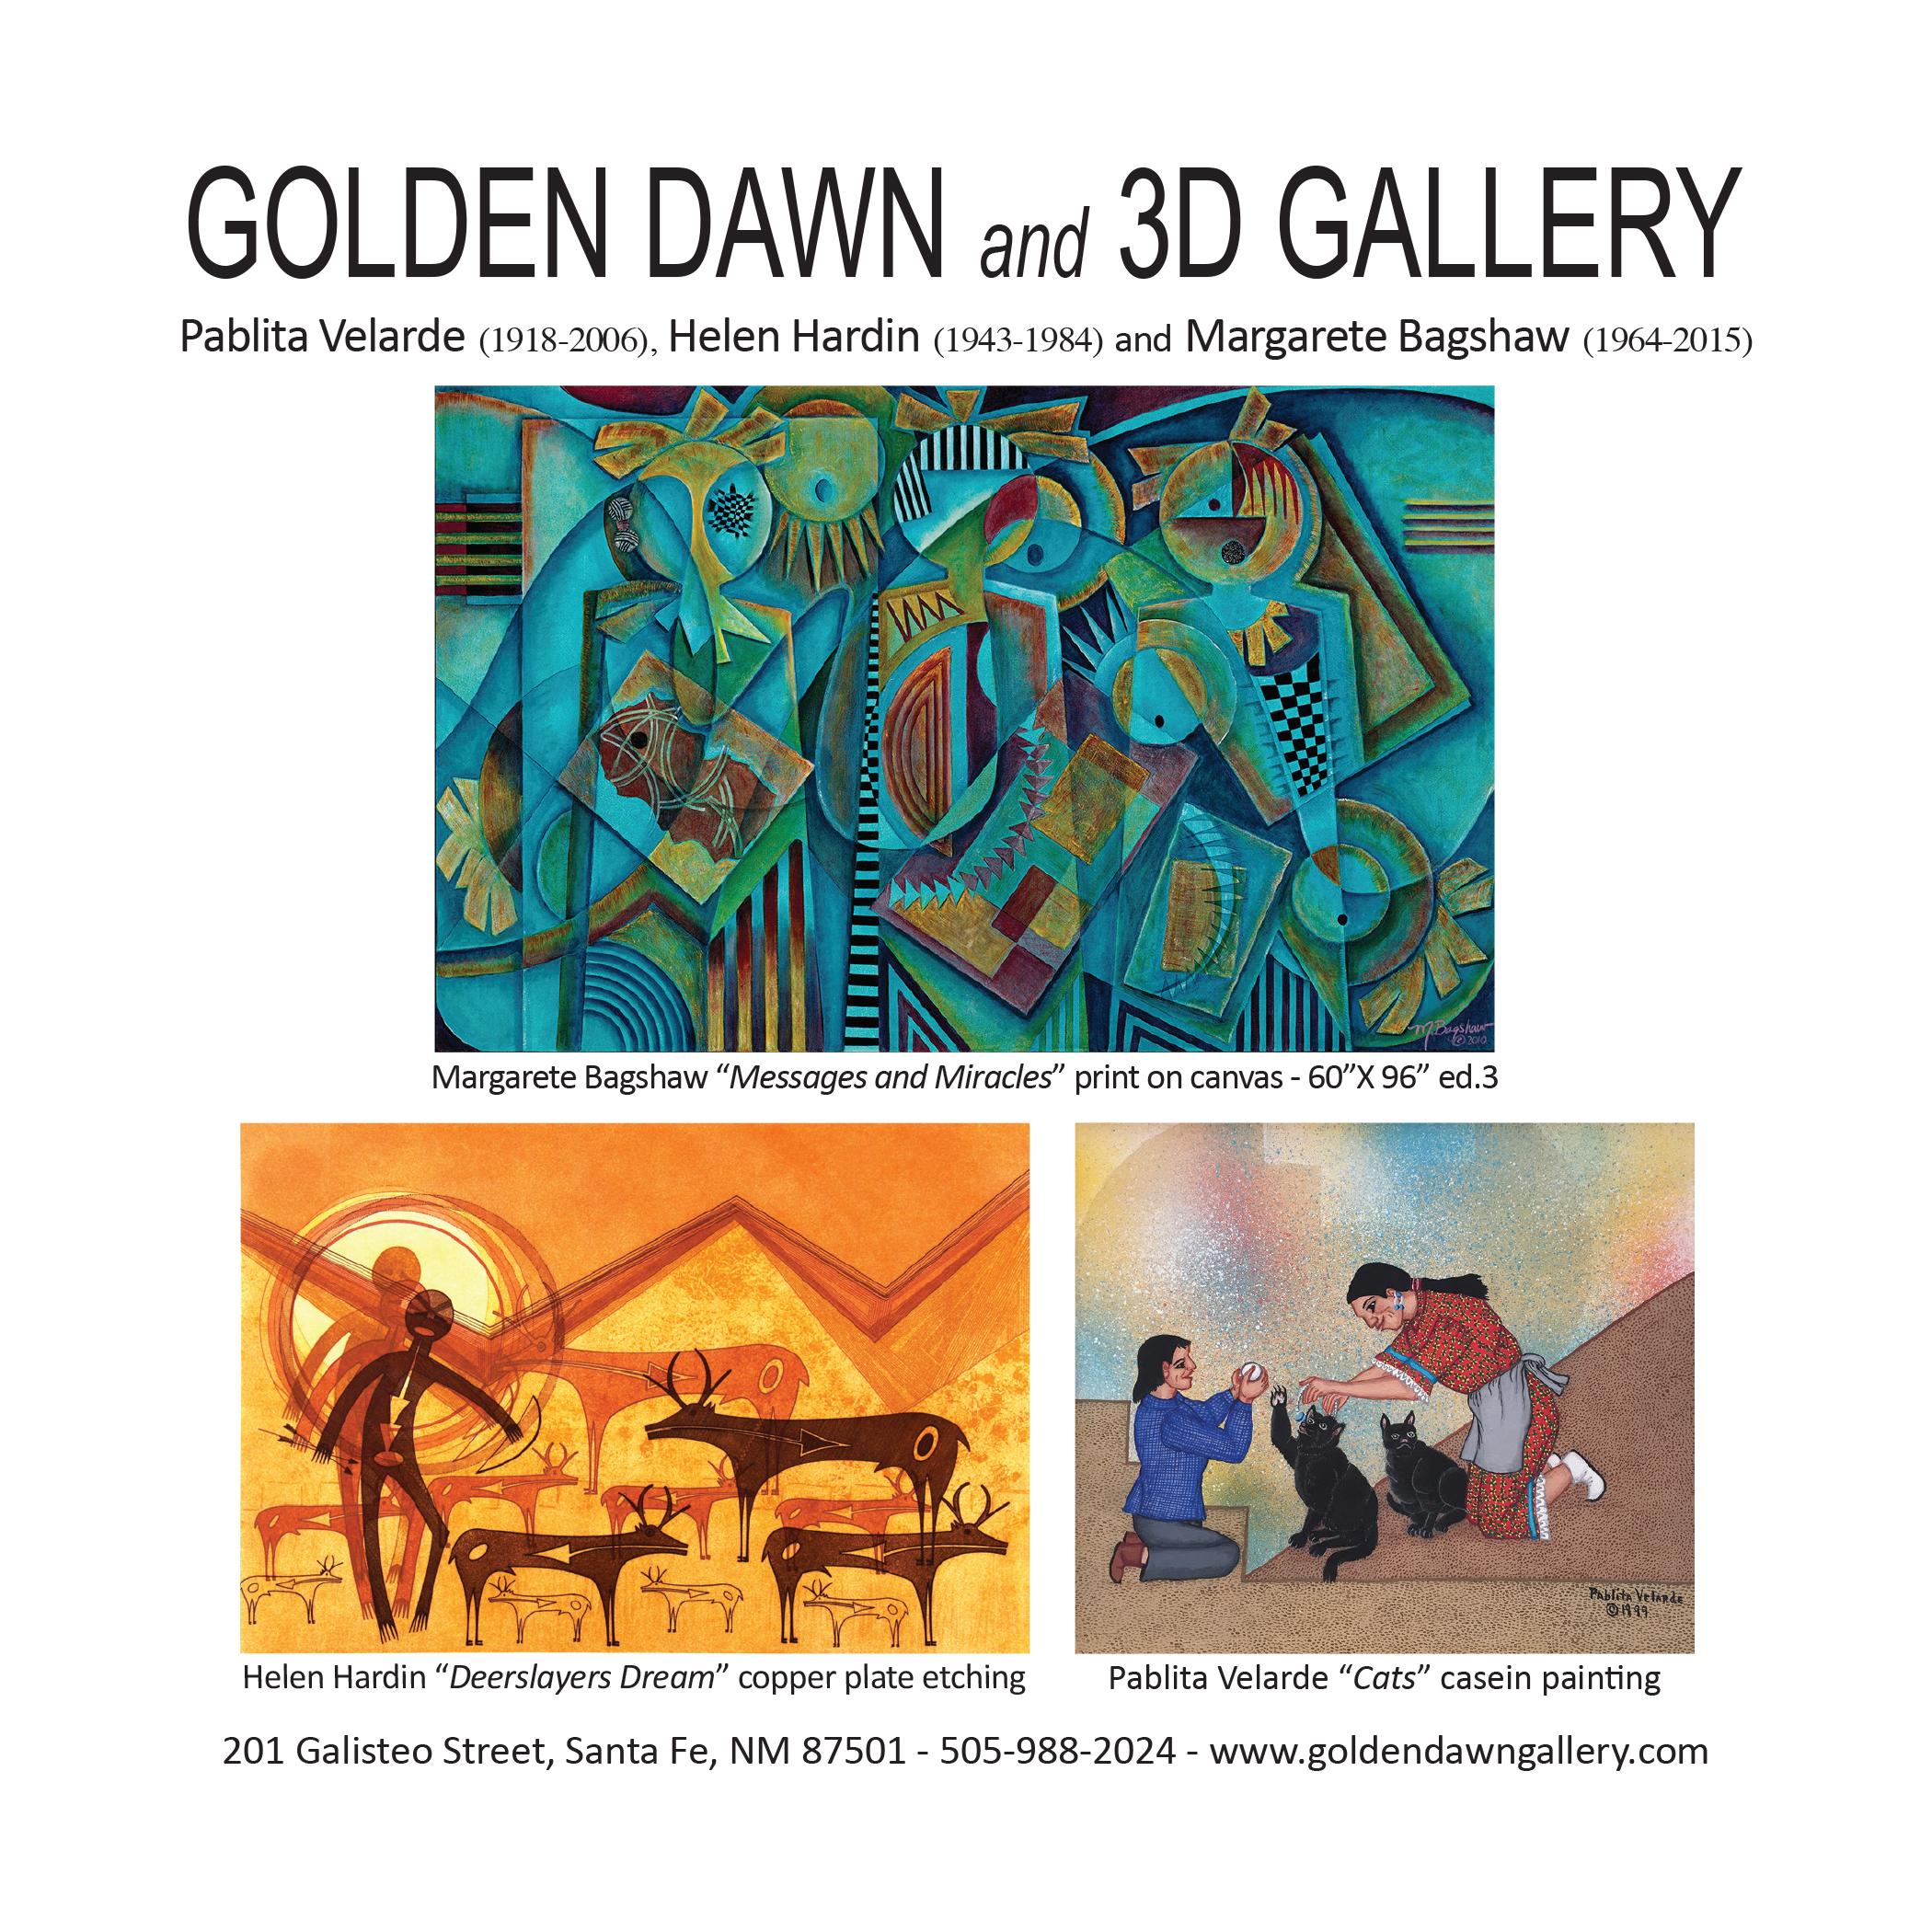 GoldenDawn-EG-SFT2017-18-WhiteAd.jpg